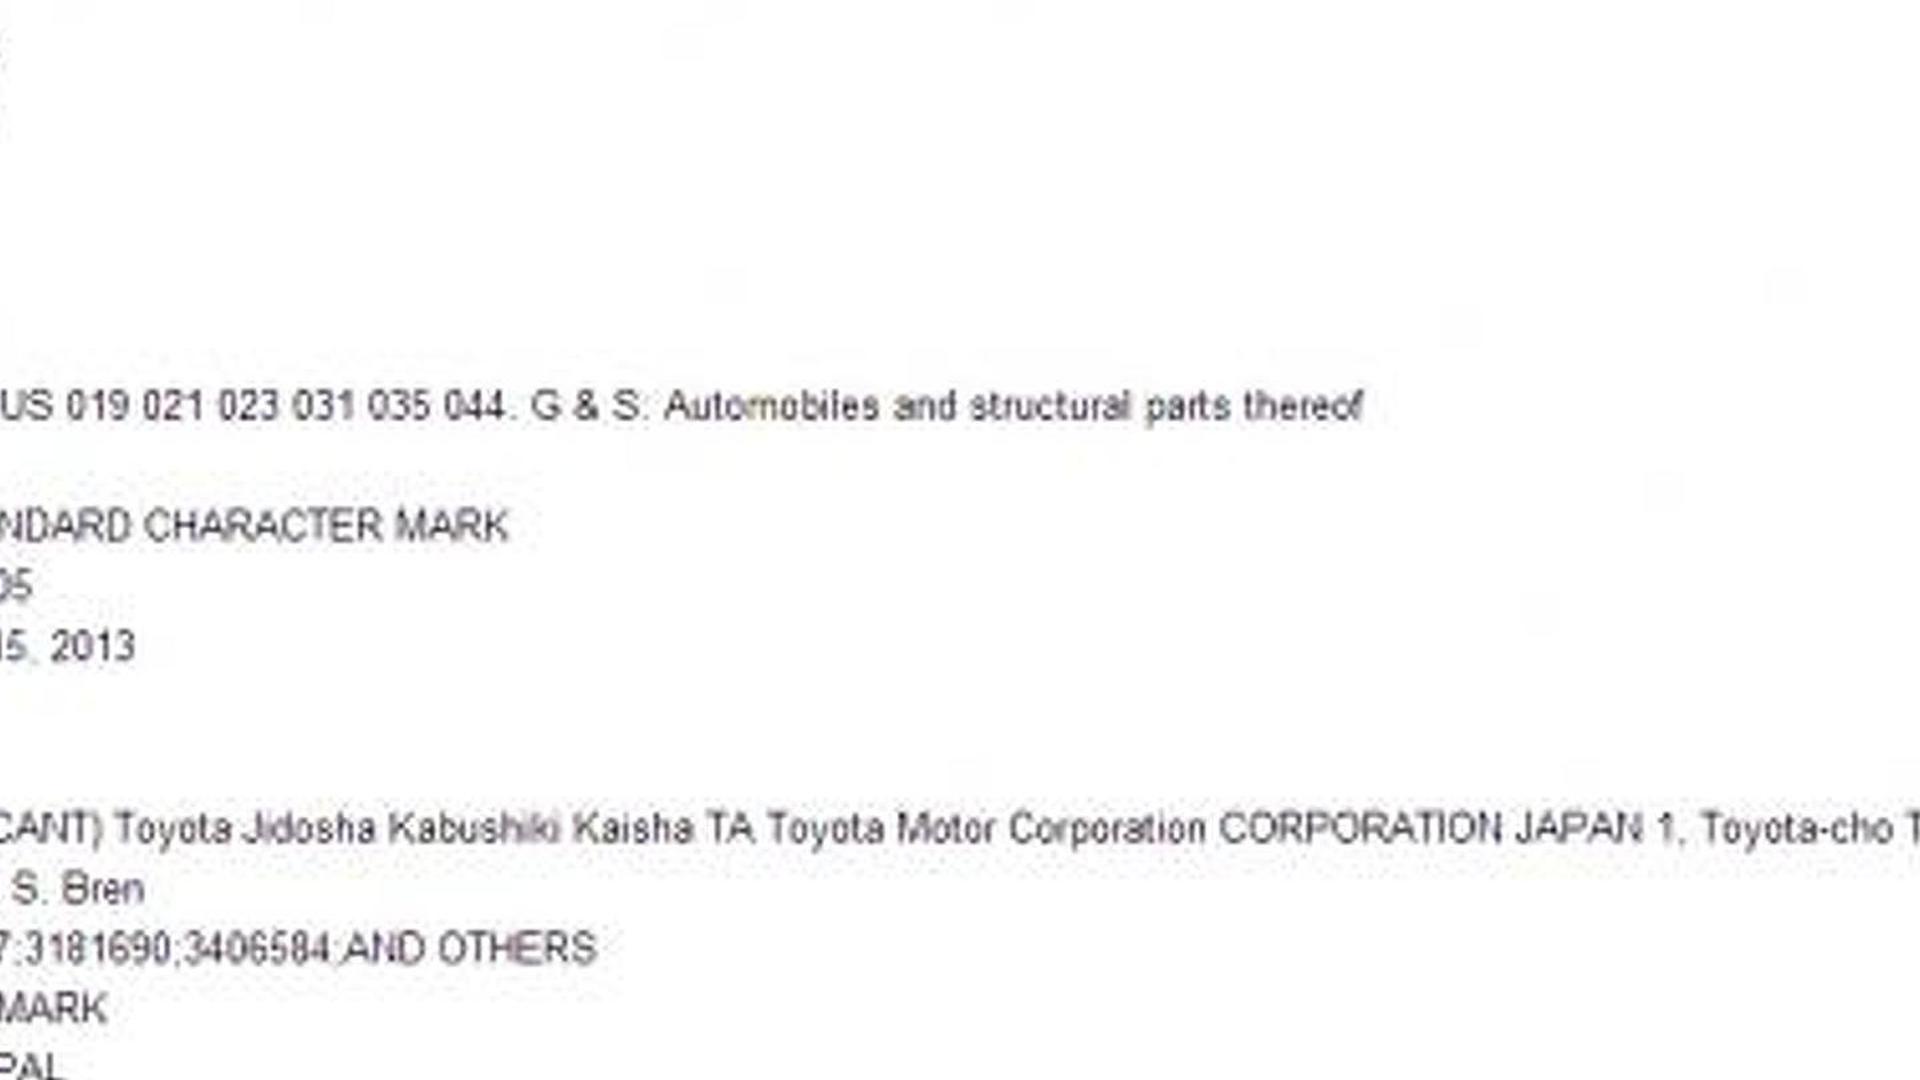 Lexus moves to trademark the GS F moniker